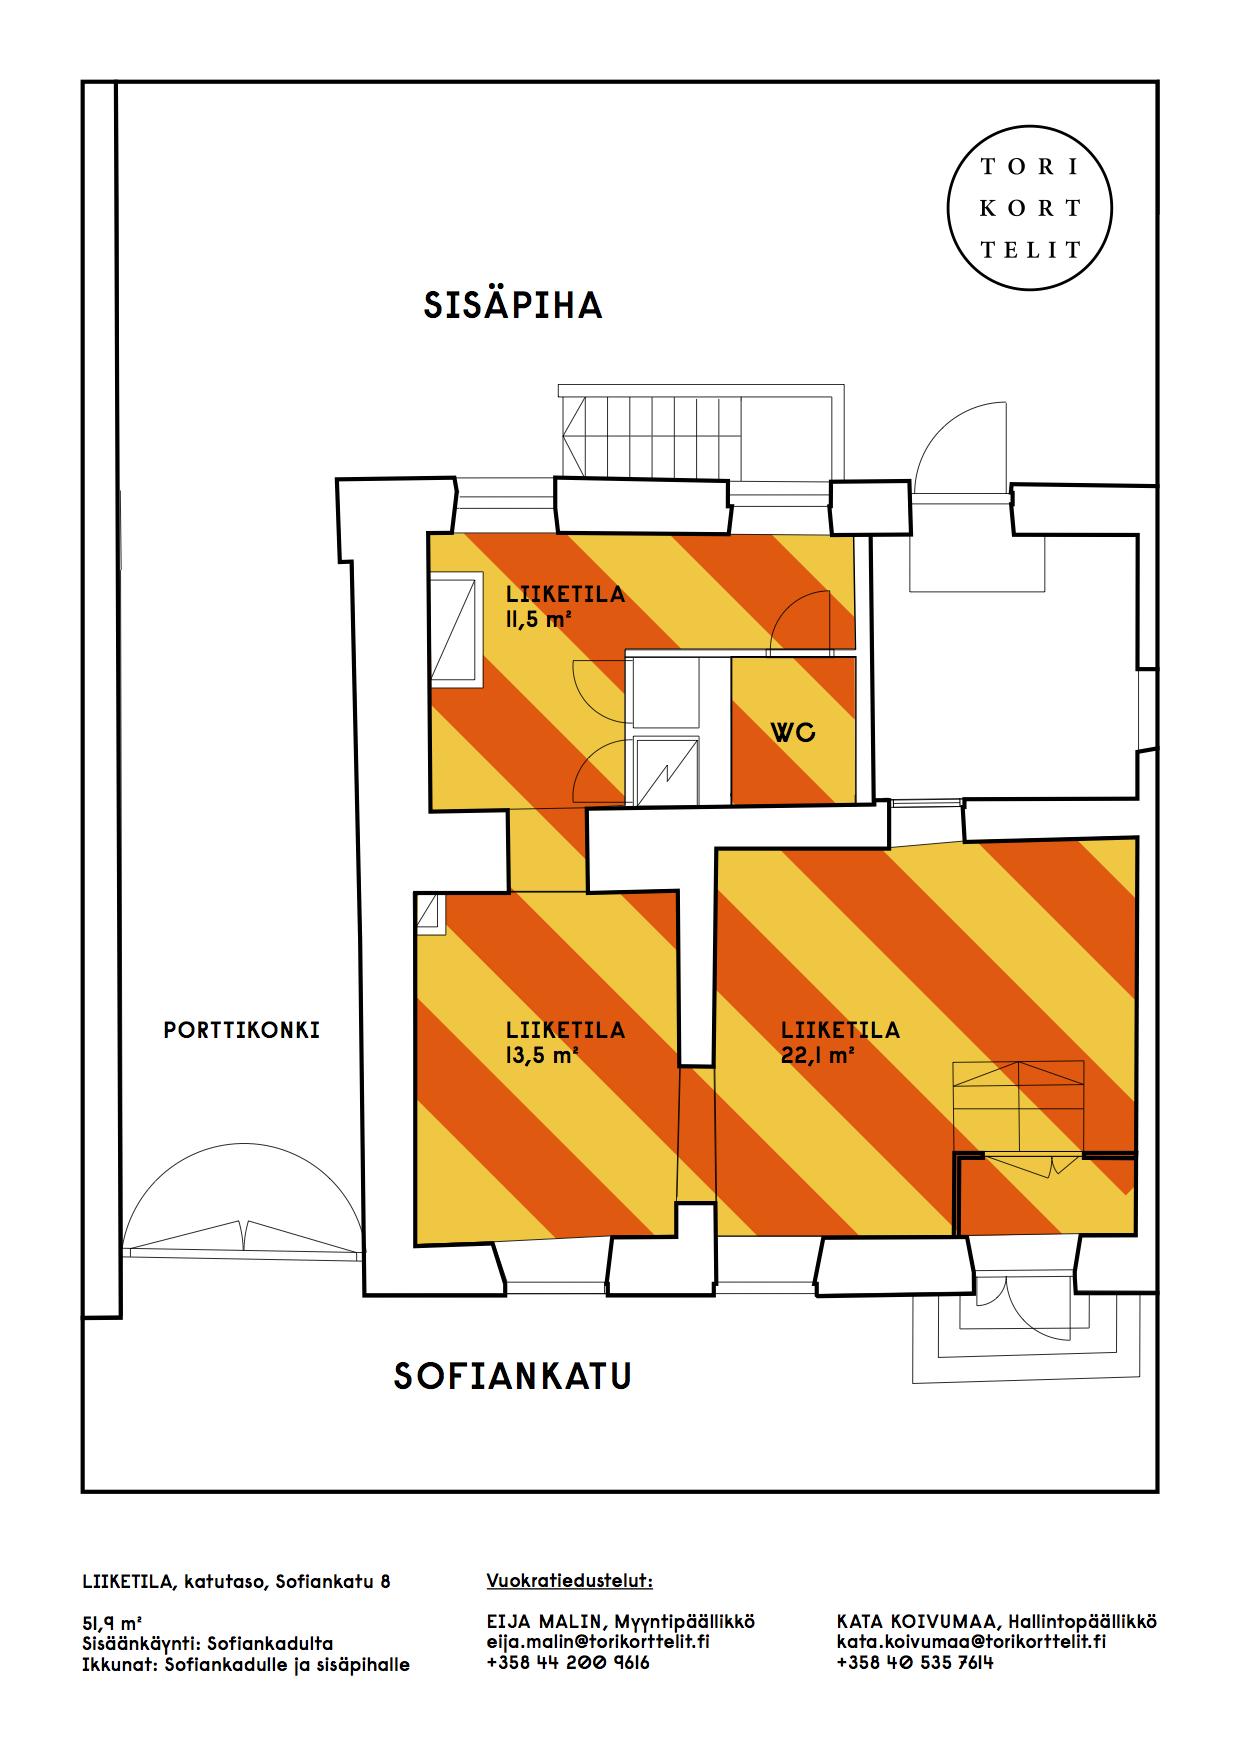 Sofiankatu 8, Keskusta, Helsinki